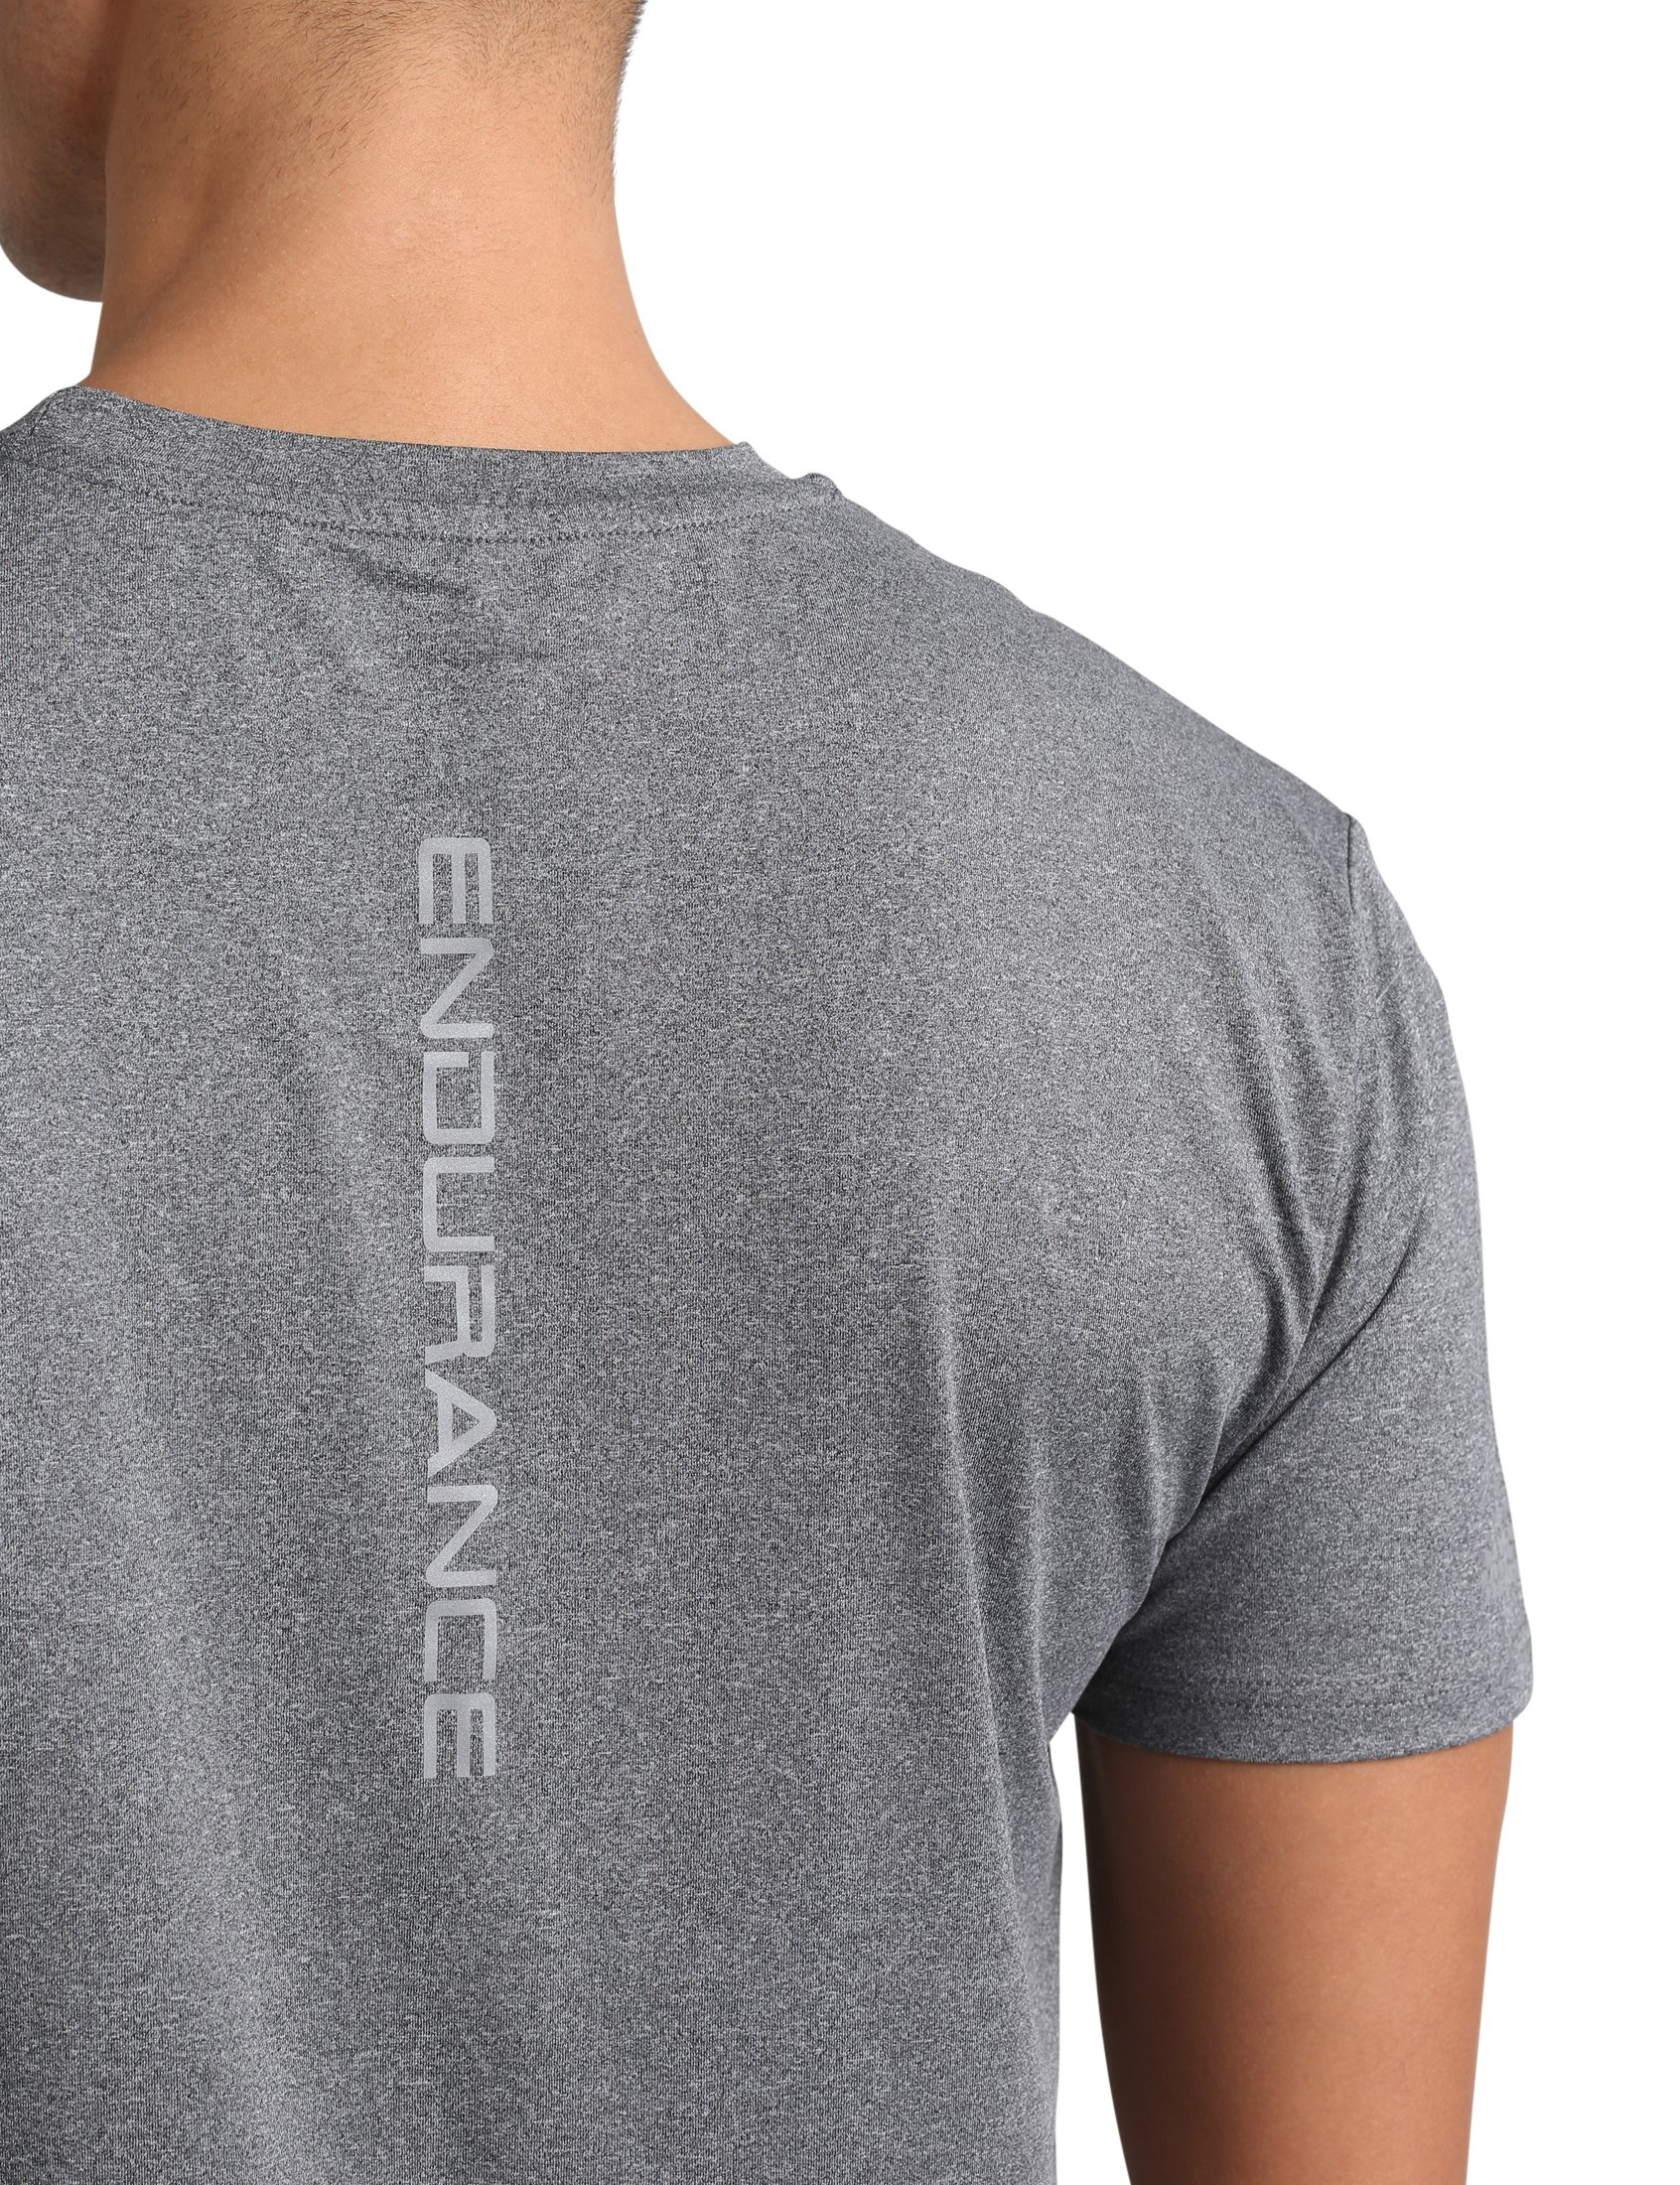 ef0ef13bf Ultrasport Men's T-Shirt Endurance Spilsby – ULTRASPORT UK – Nr. 1 ...